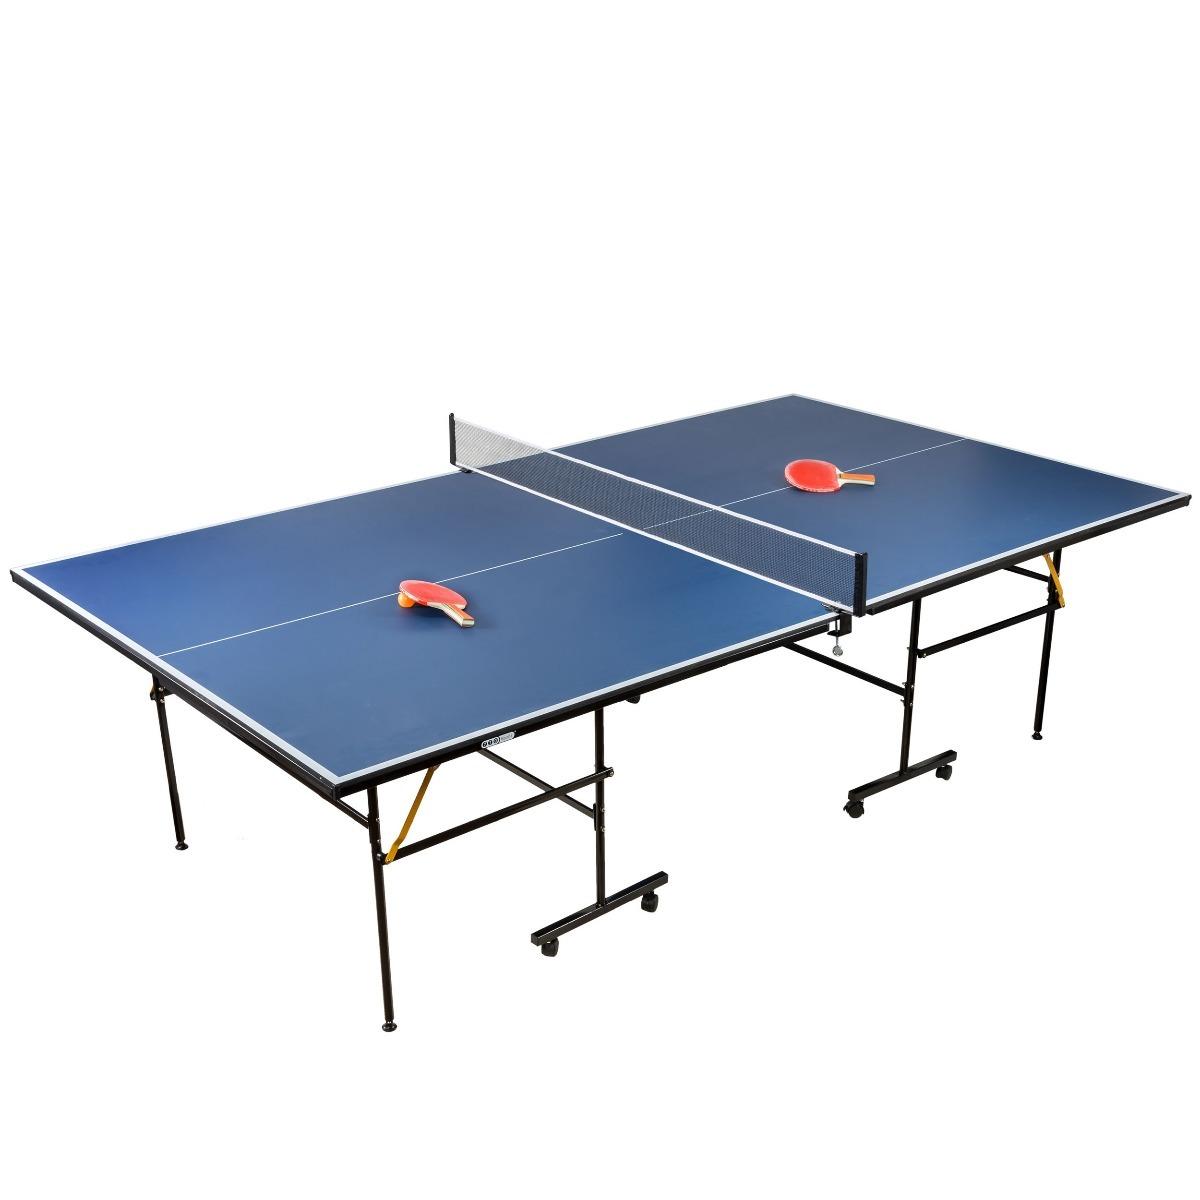 1a7a198d7 Mesa Ping Pong Profesional Plegable Tenis De Mesa (video) -   8.199 ...